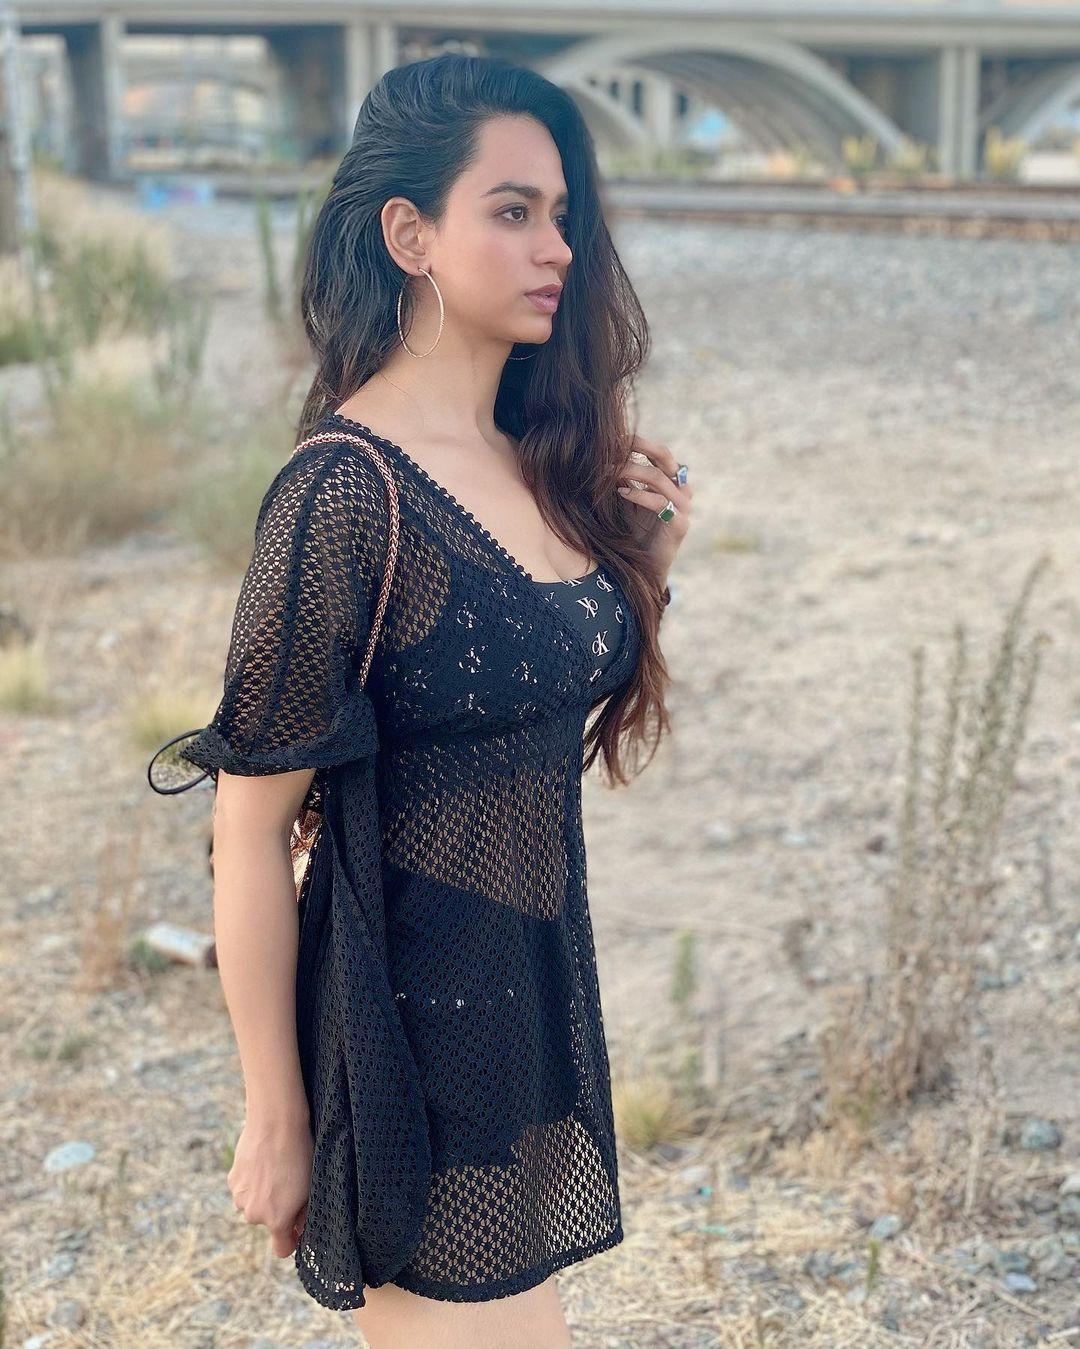 Beauty Queen Soundarya Sharma Photos (57)